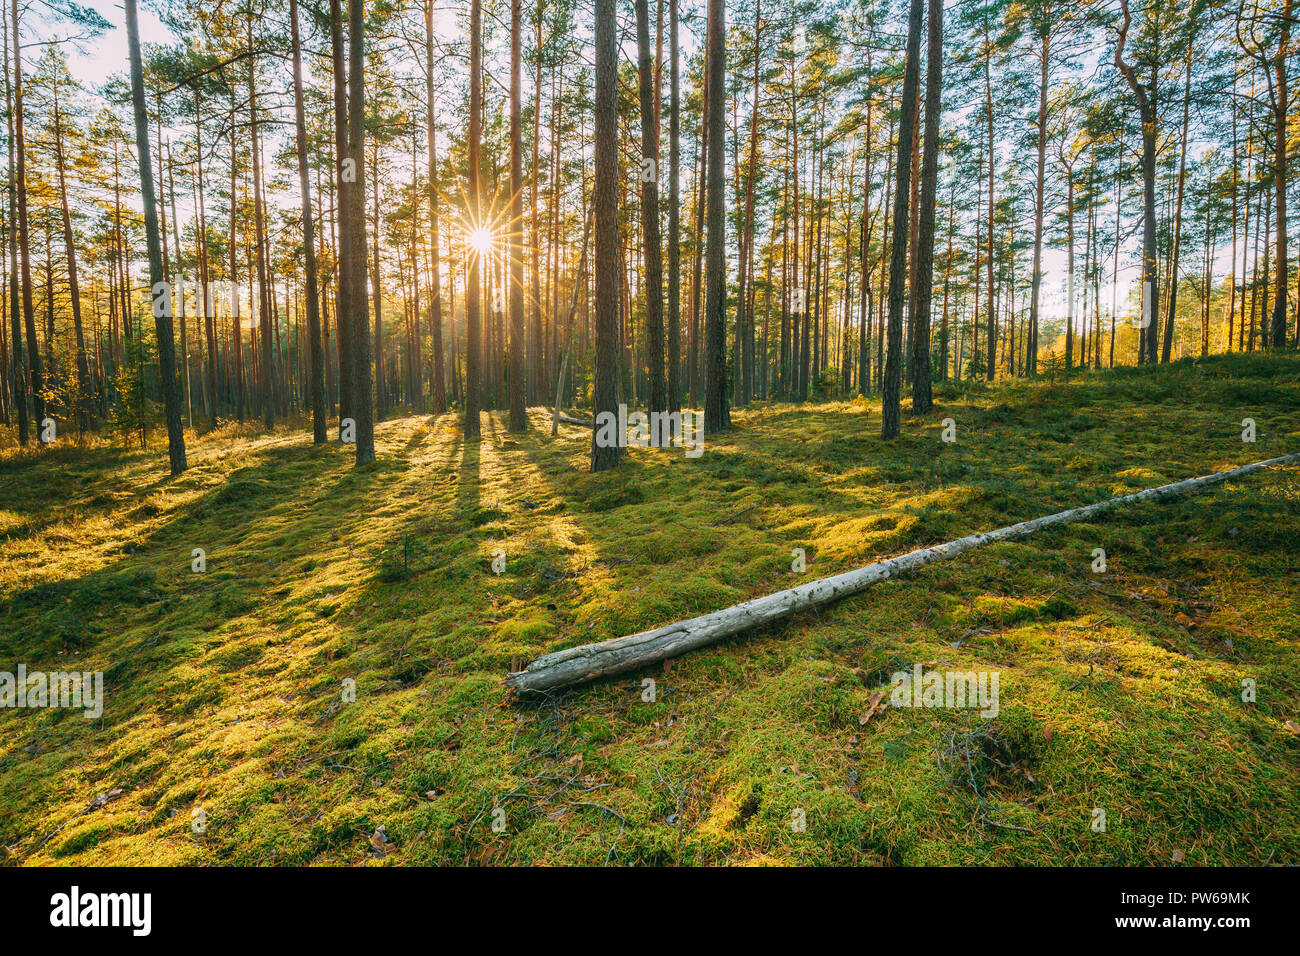 Belarus. Beautiful Sunset Sunrise Sun Sunshine In Sunny Summer Coniferous Forest. Sunlight Sunrays Shine Through Woods In Forest Landscape. Stock Photo